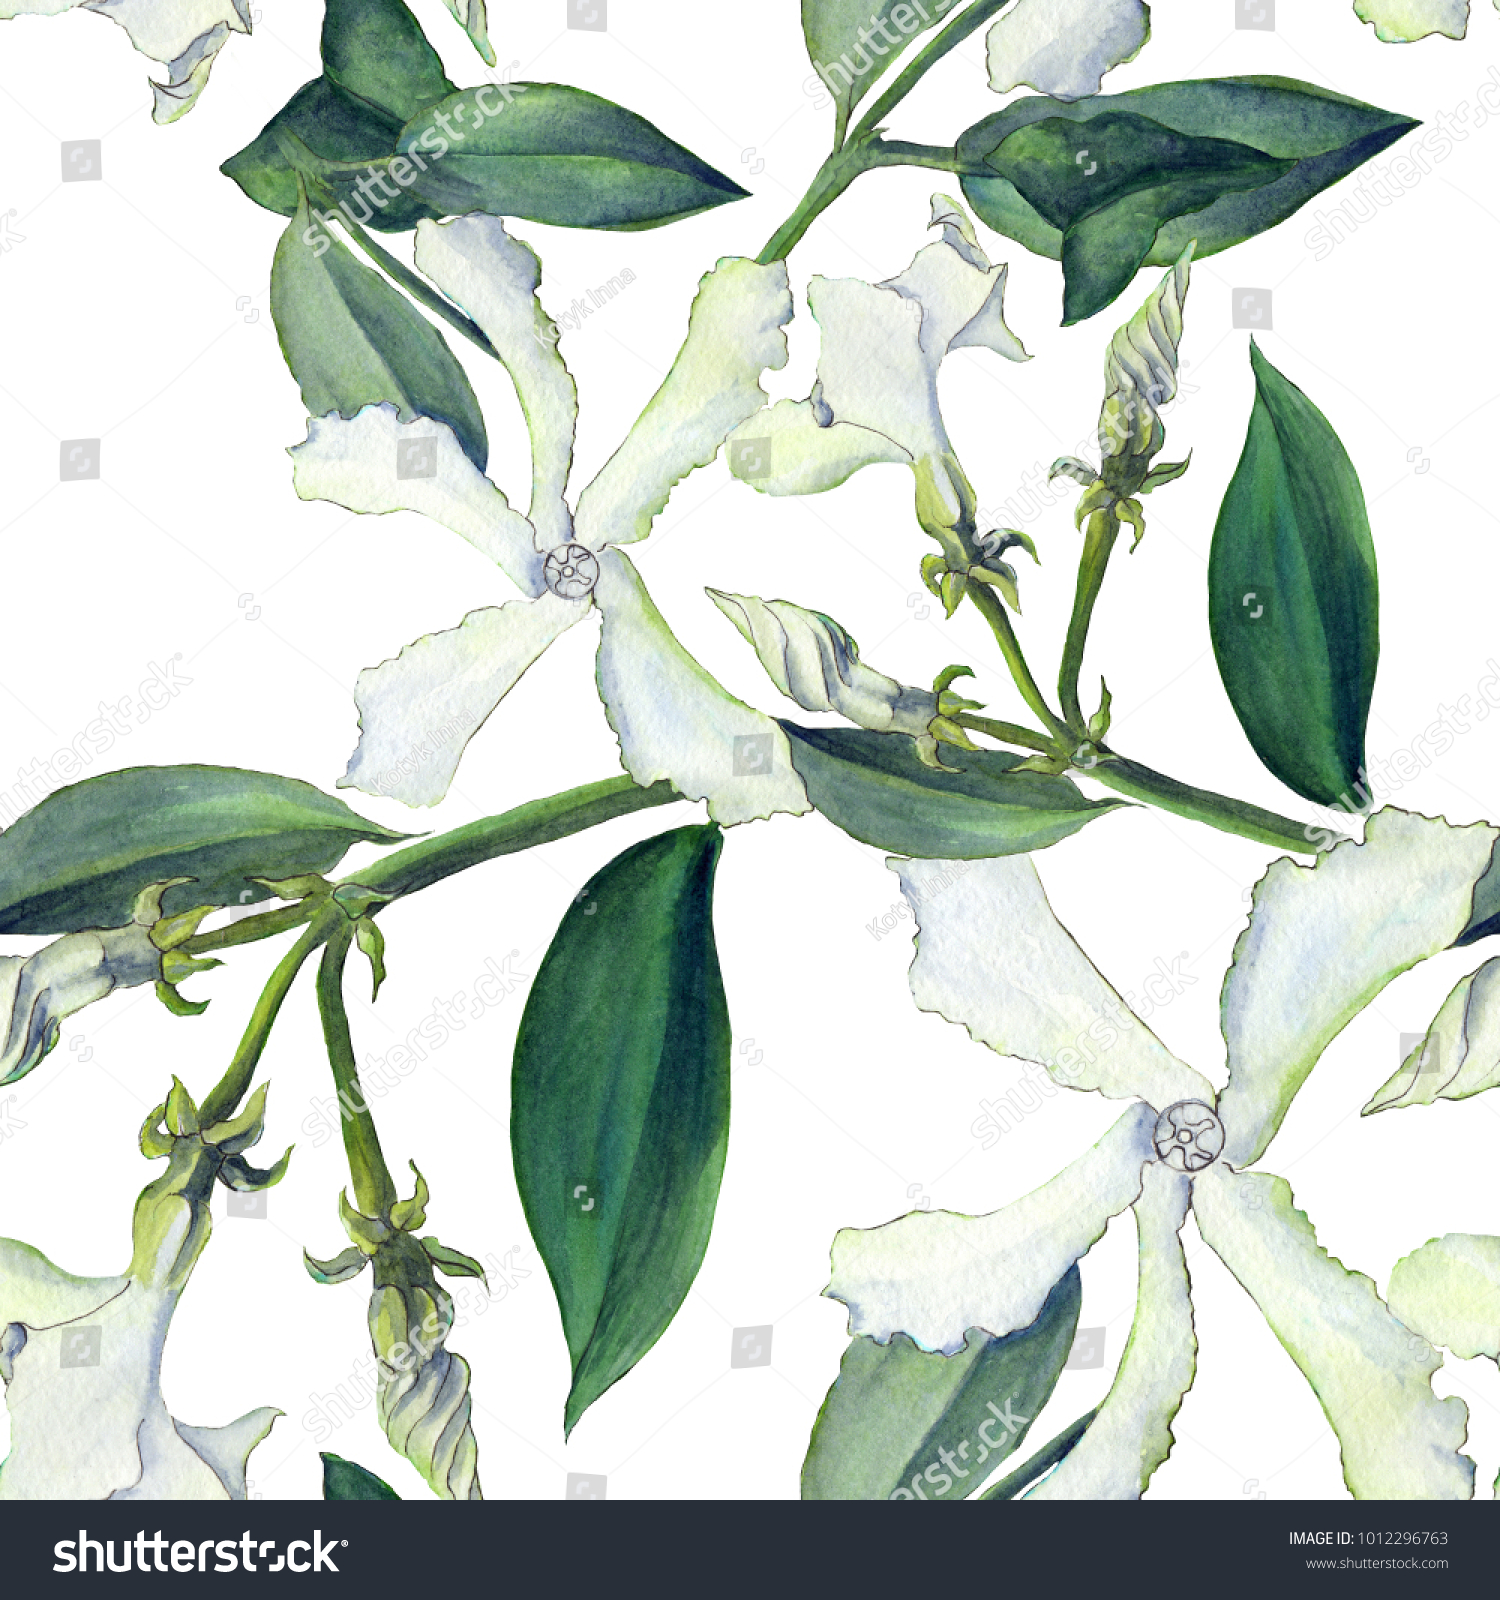 Royalty Free Stock Illustration Of Jasmine Flowers Buds Leaves